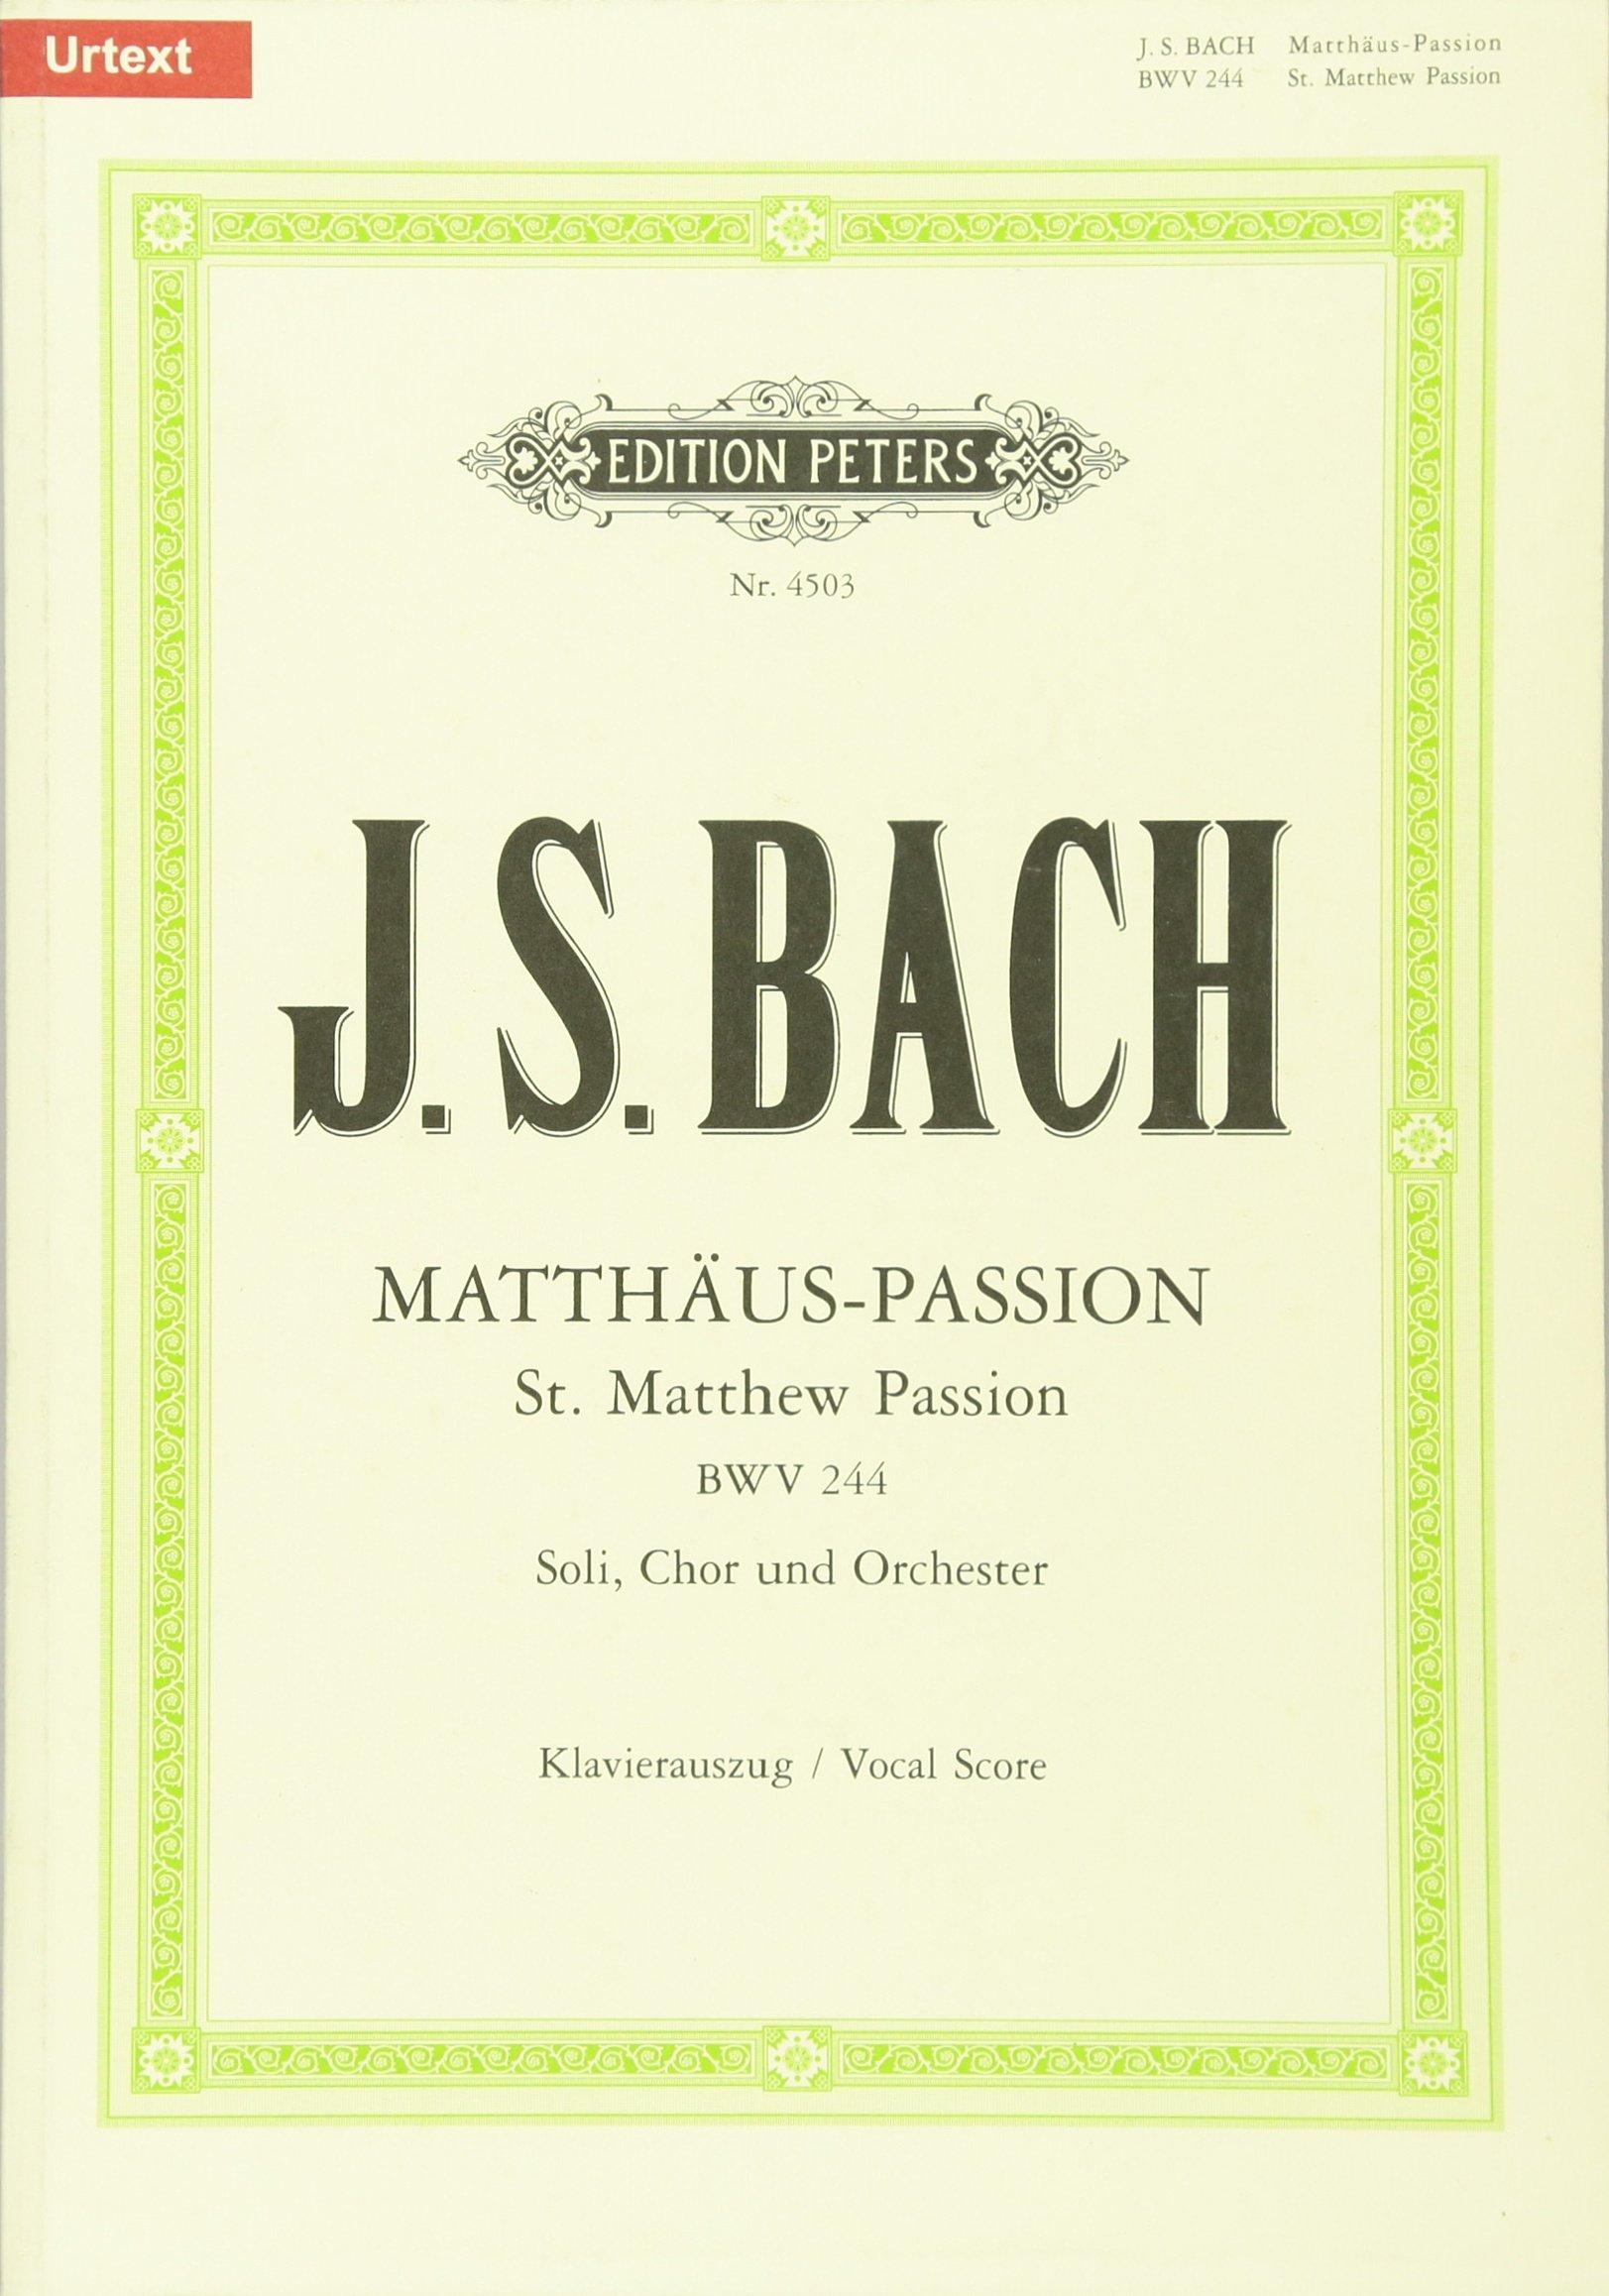 Matthäus Passion BWV 244. Soli Chor Und Orchester. Klavierauszug